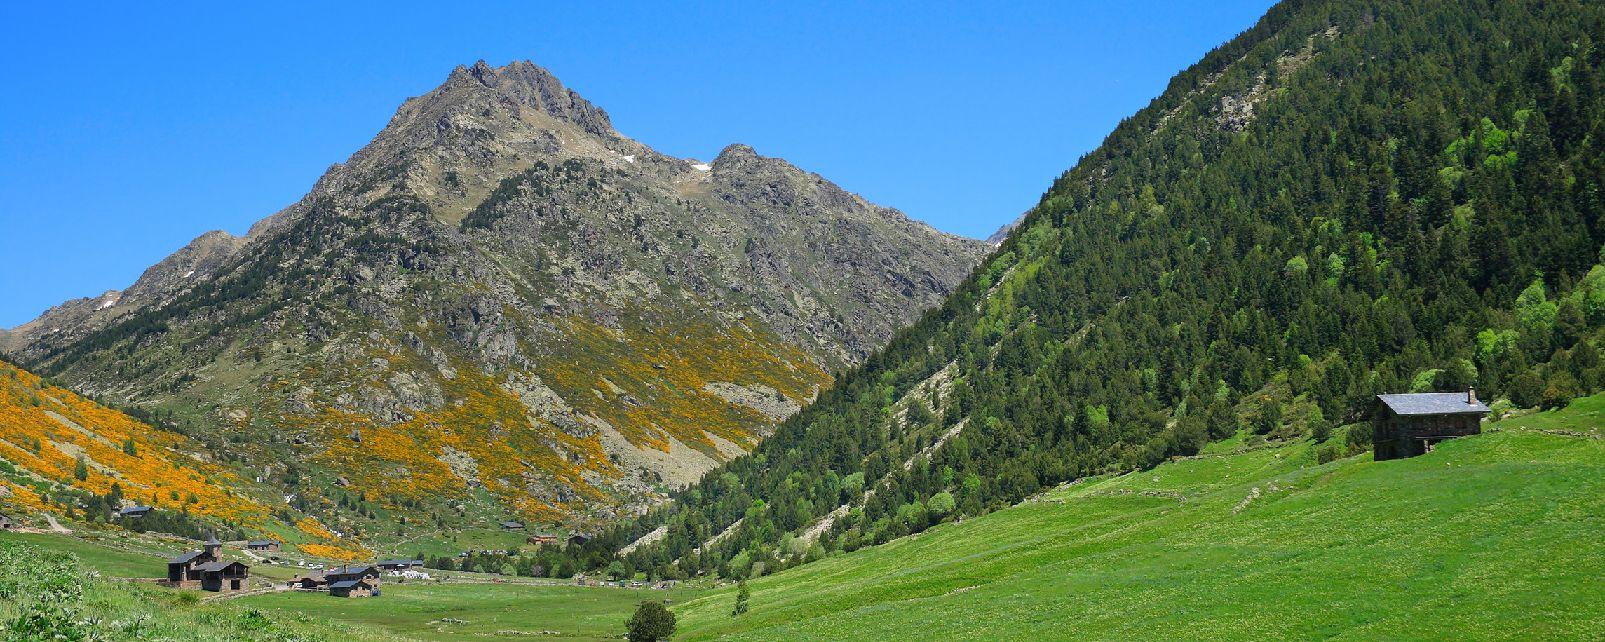 La geografia andorrana , Andorra